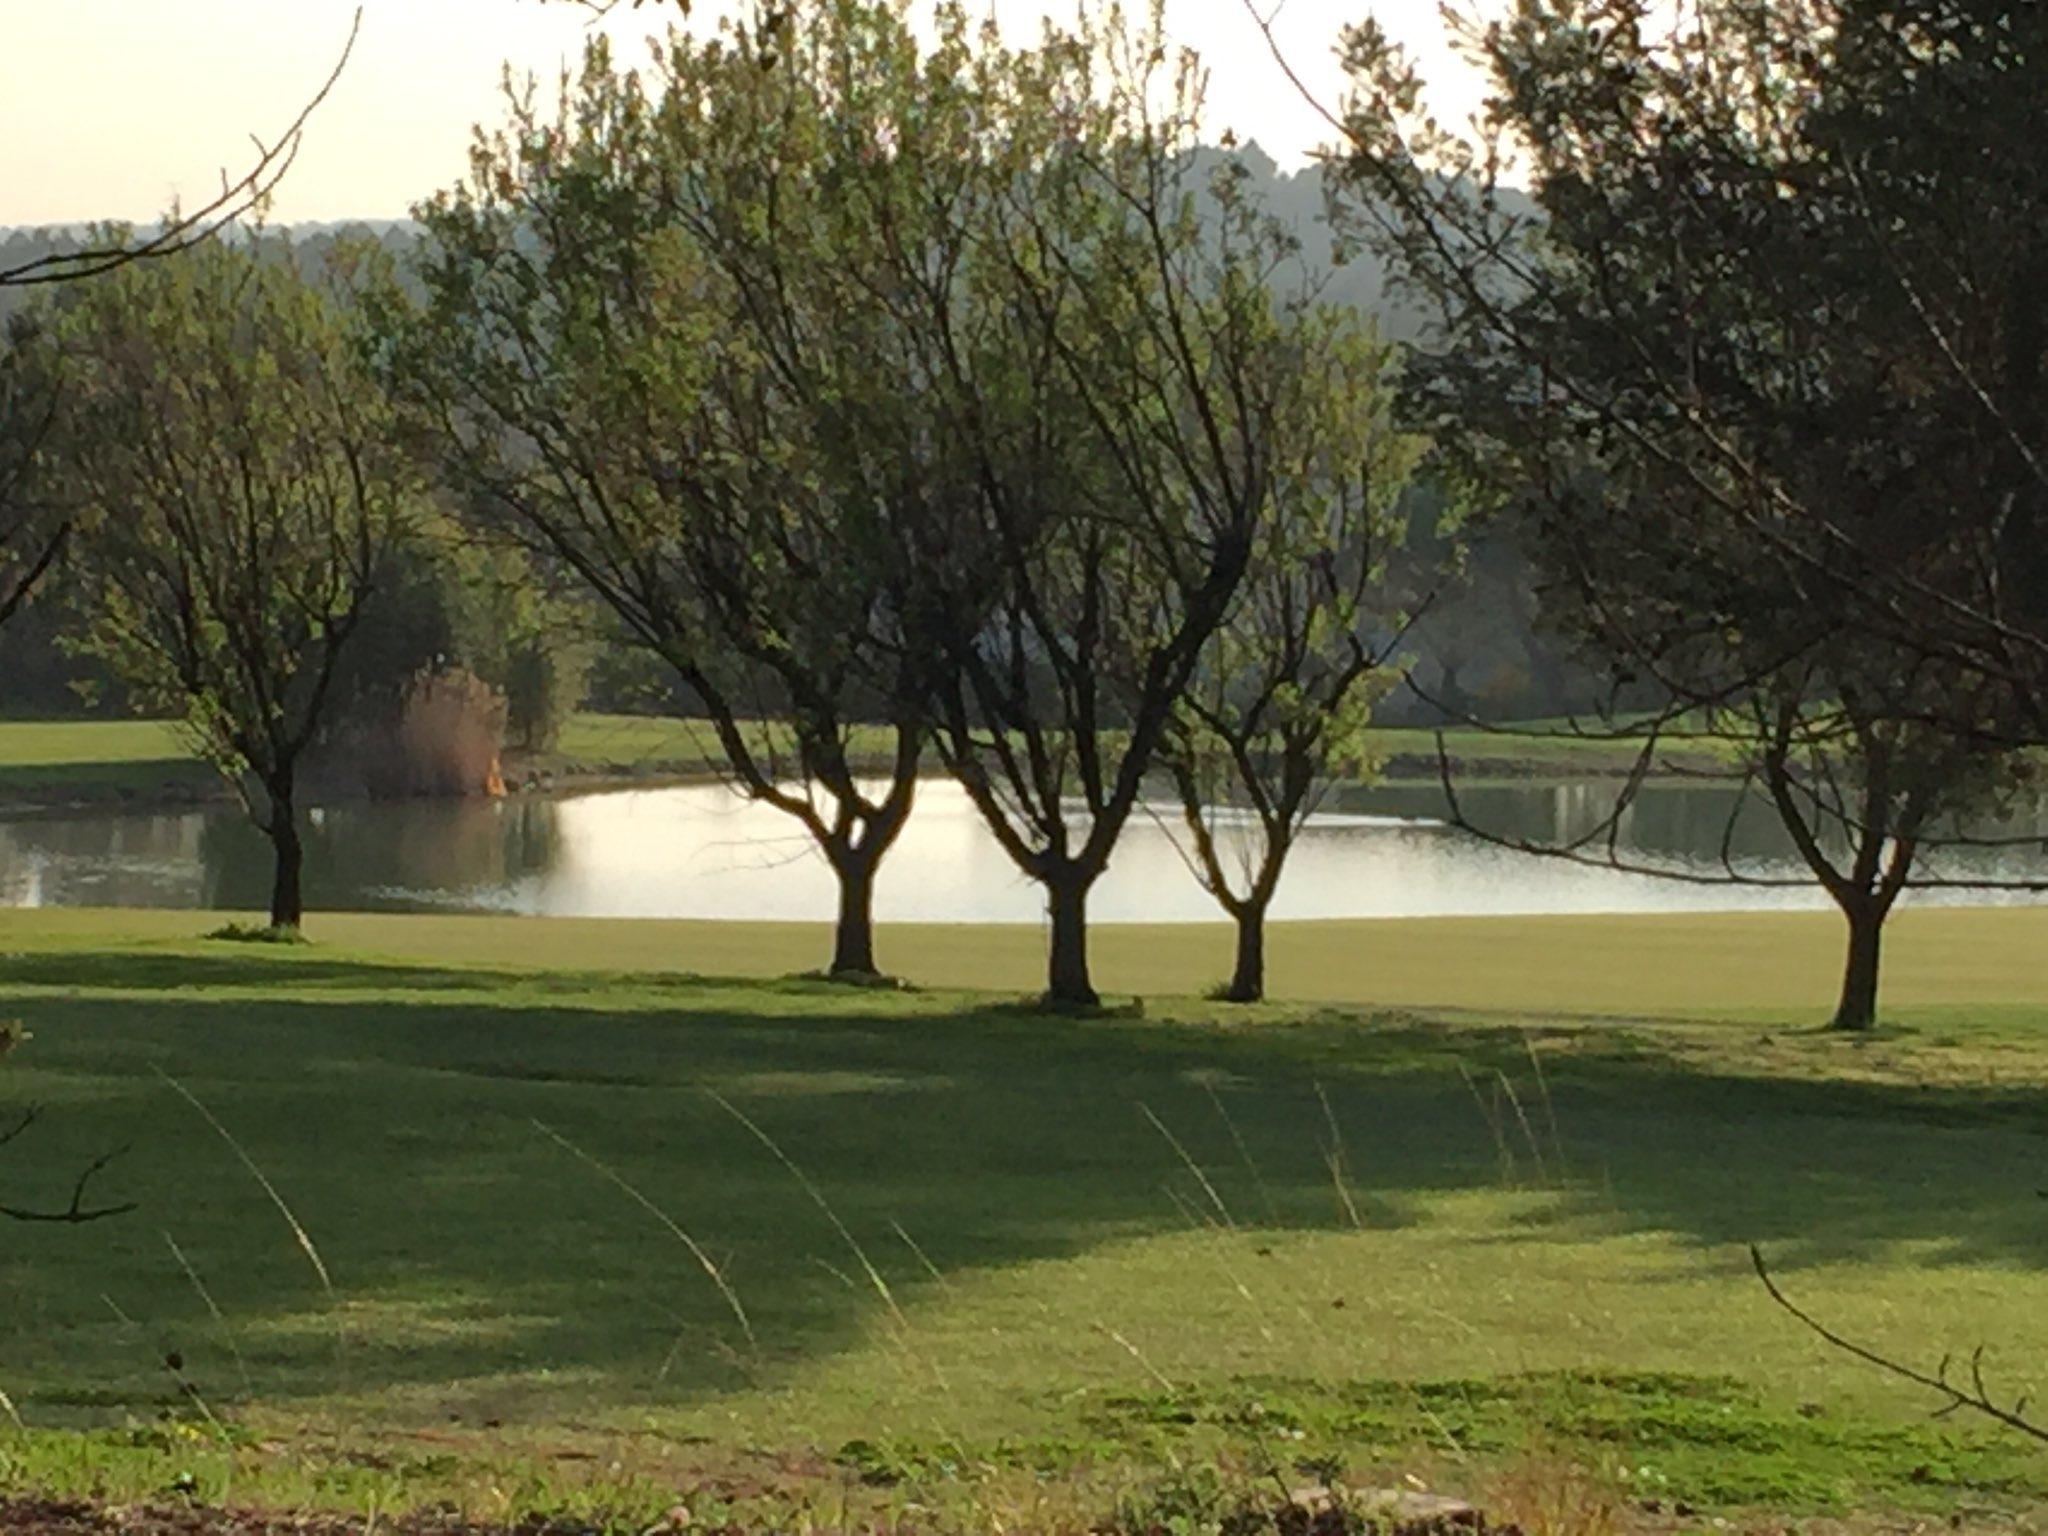 Golf Pont Royal https://t.co/Xu0NTPjUvN